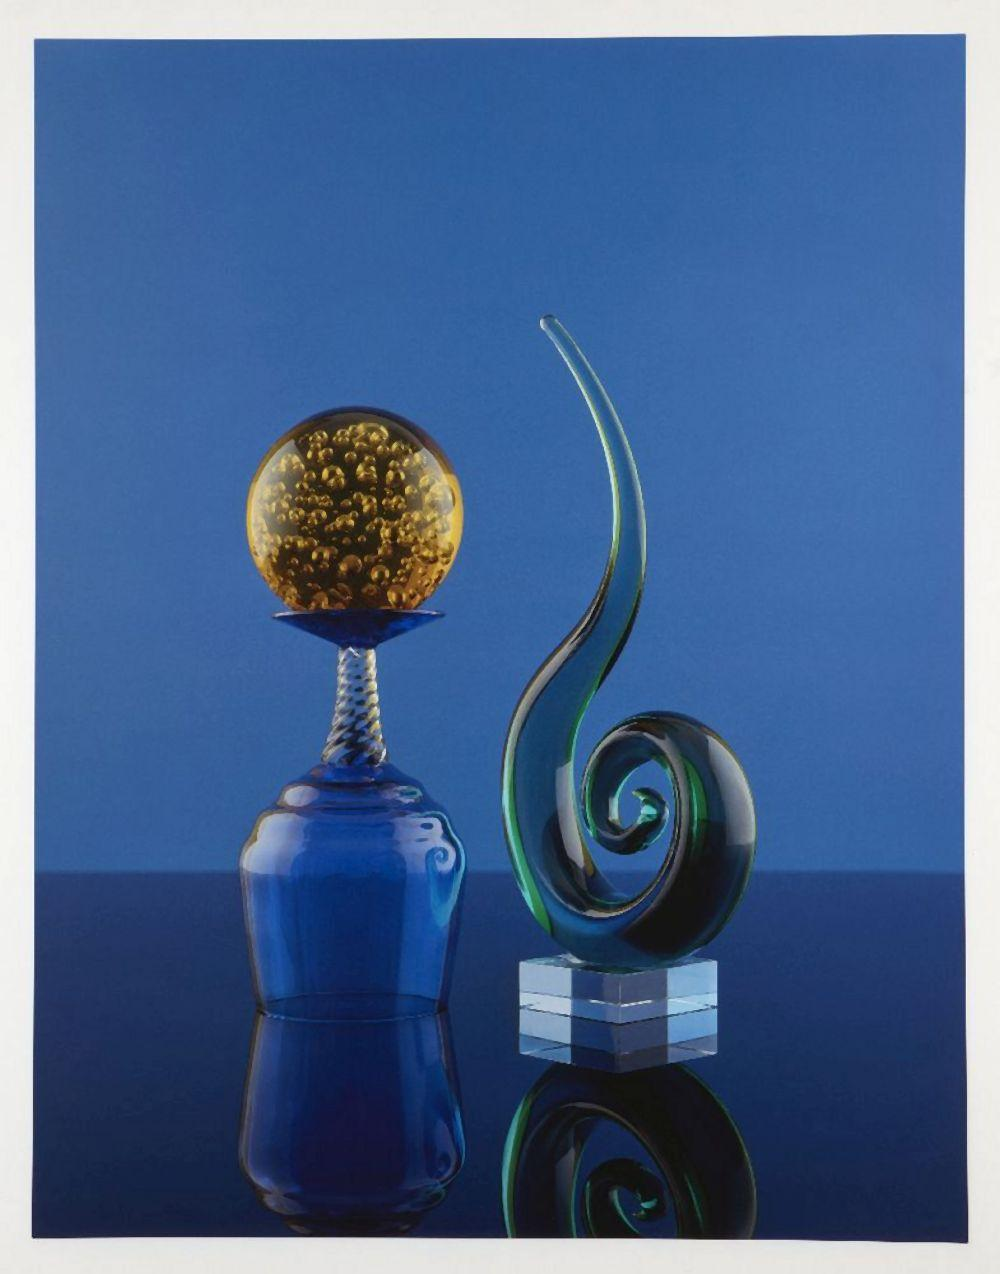 Sarah Jones, British 1959- Cabinet (Spiral), 2016; archival inkjet print in colours on 310gsm C